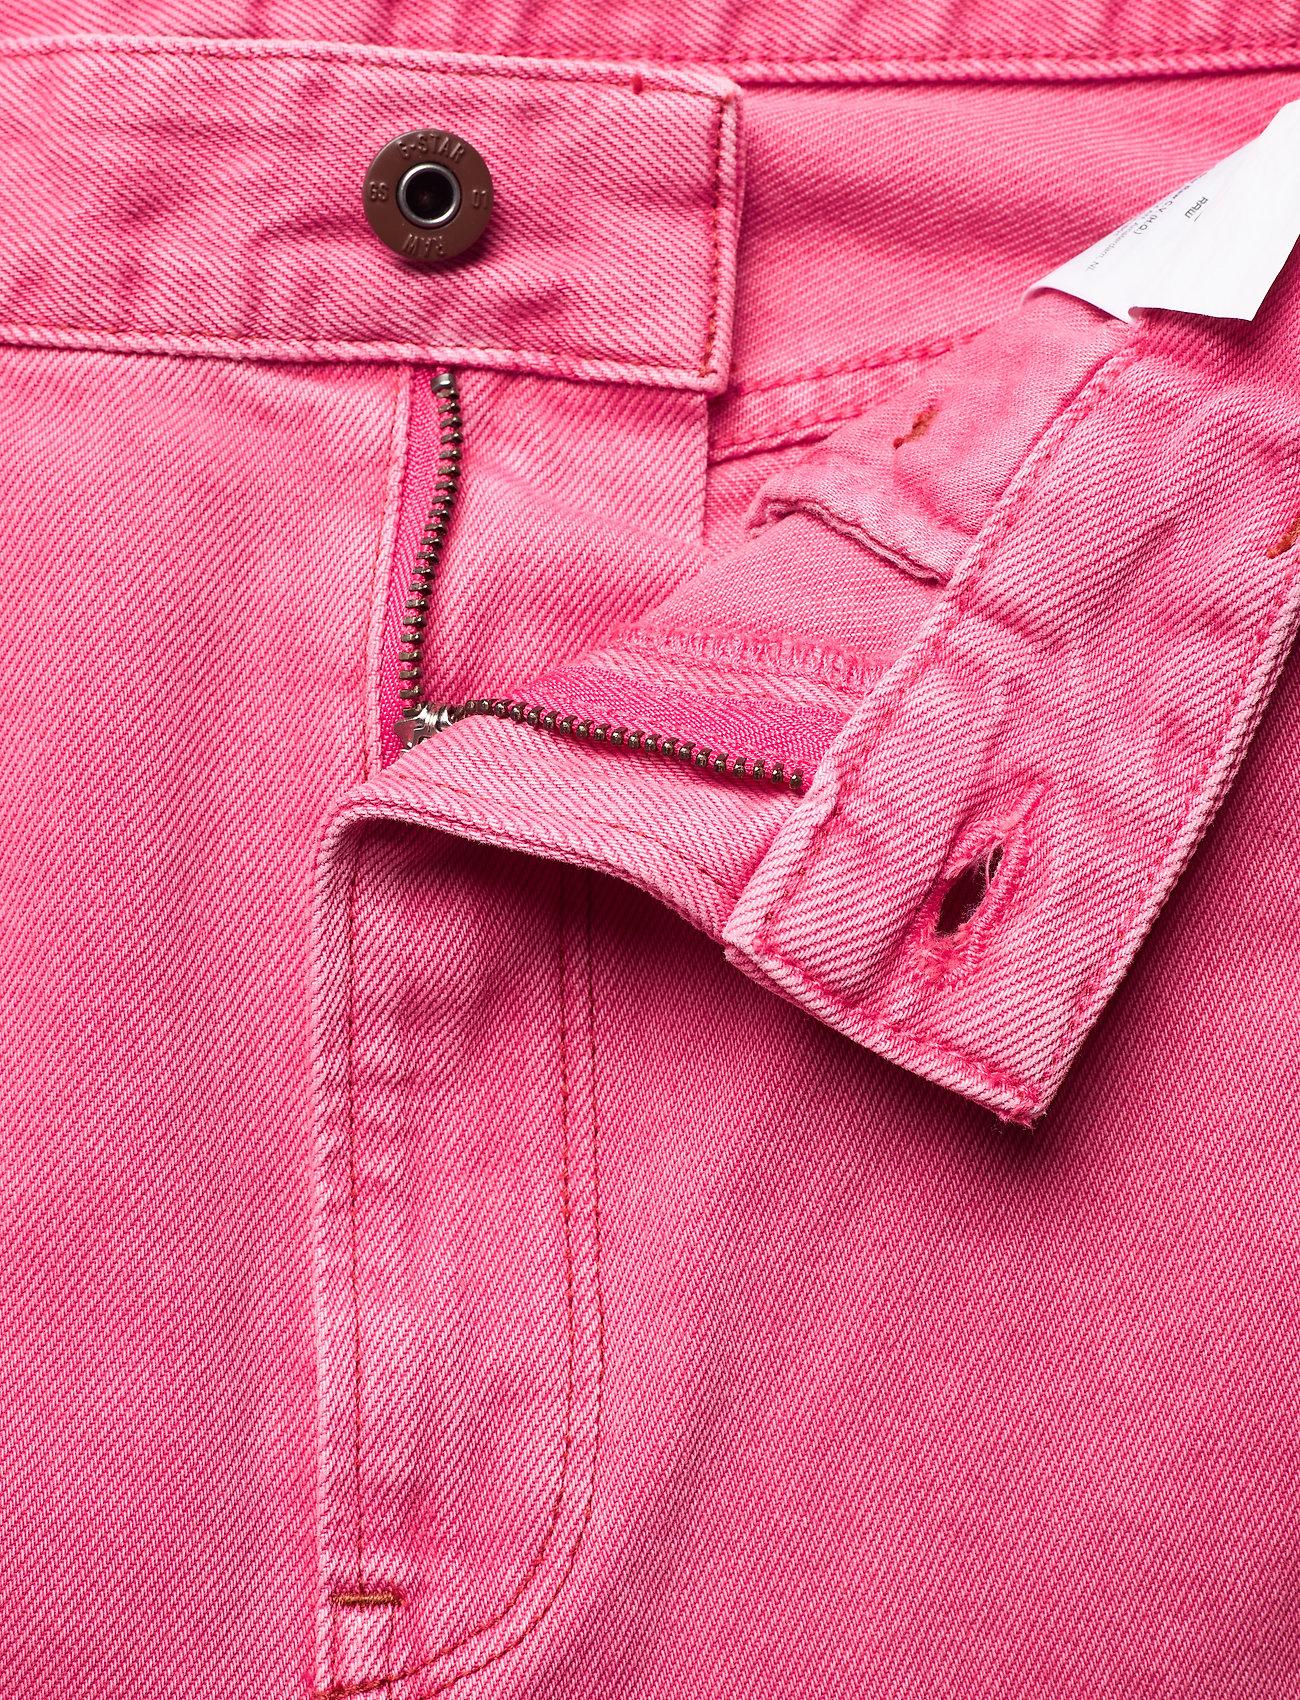 G-star RAW - Tedie Ultra High Long Straight Wmn - straight regular - recycrom petunia pink gd - 2